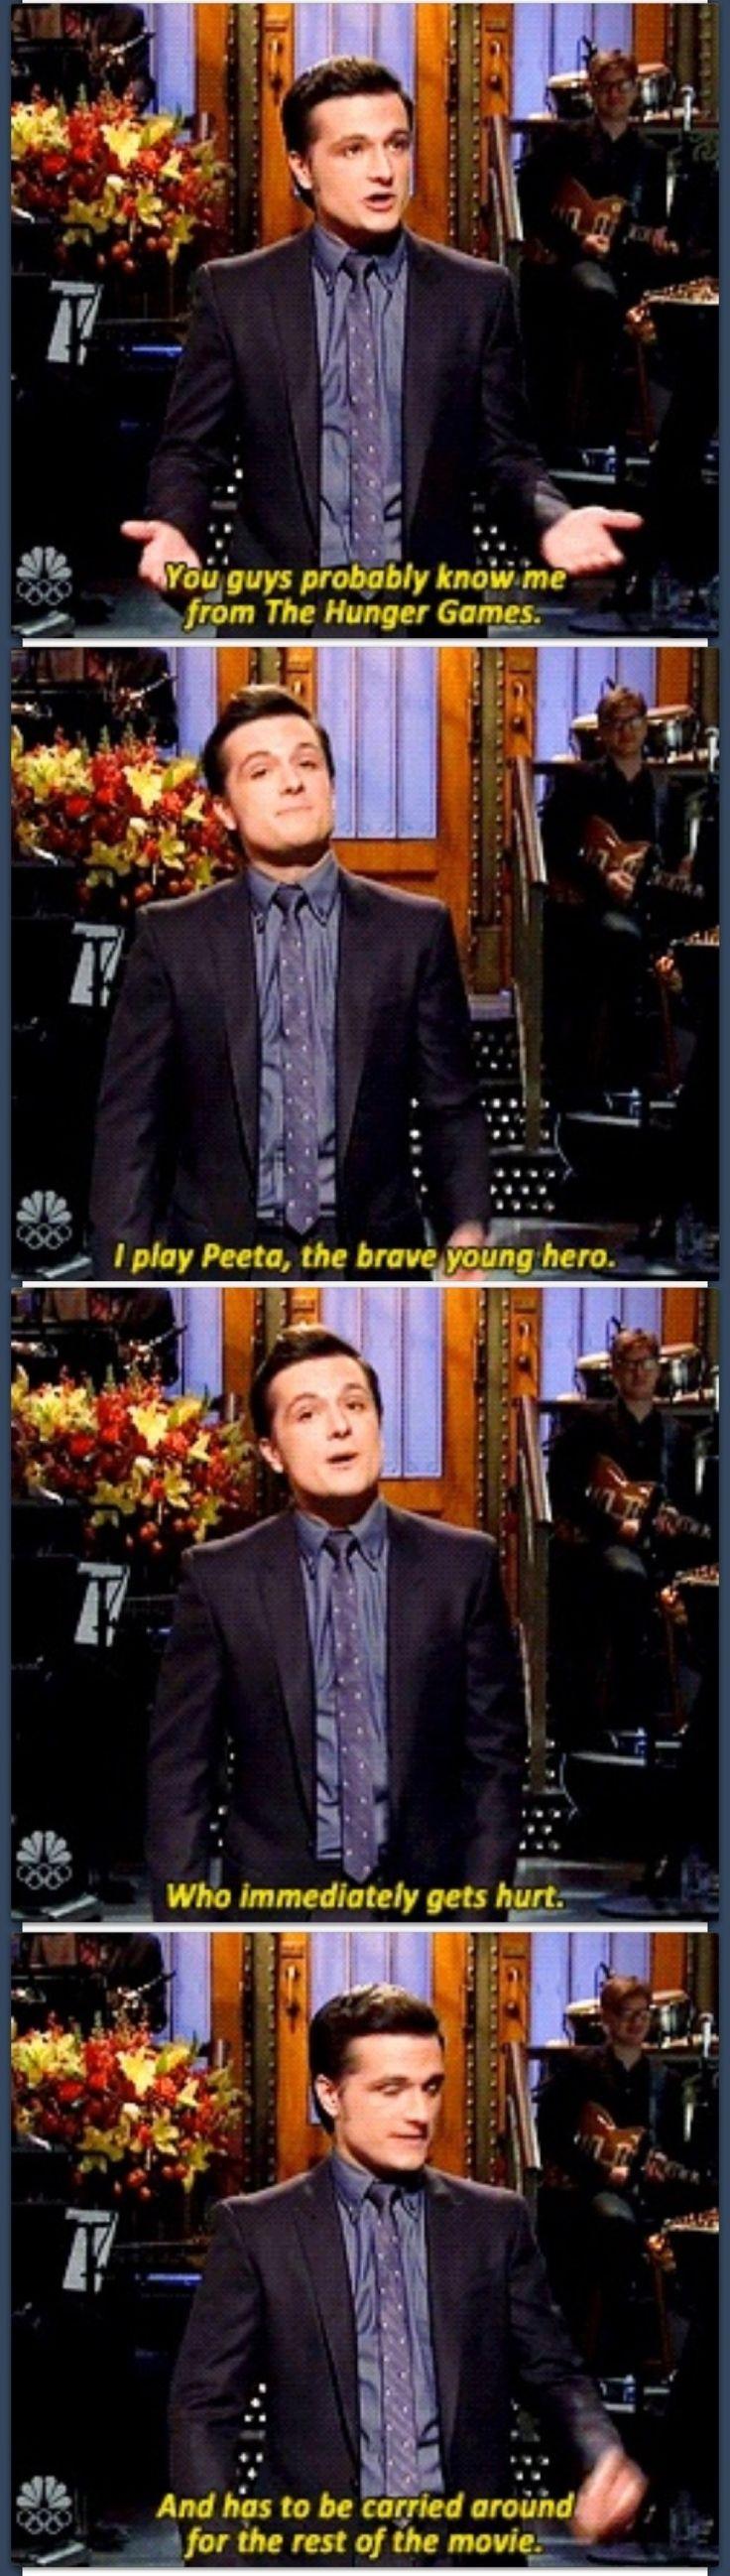 Josh Hutcherson on SNL